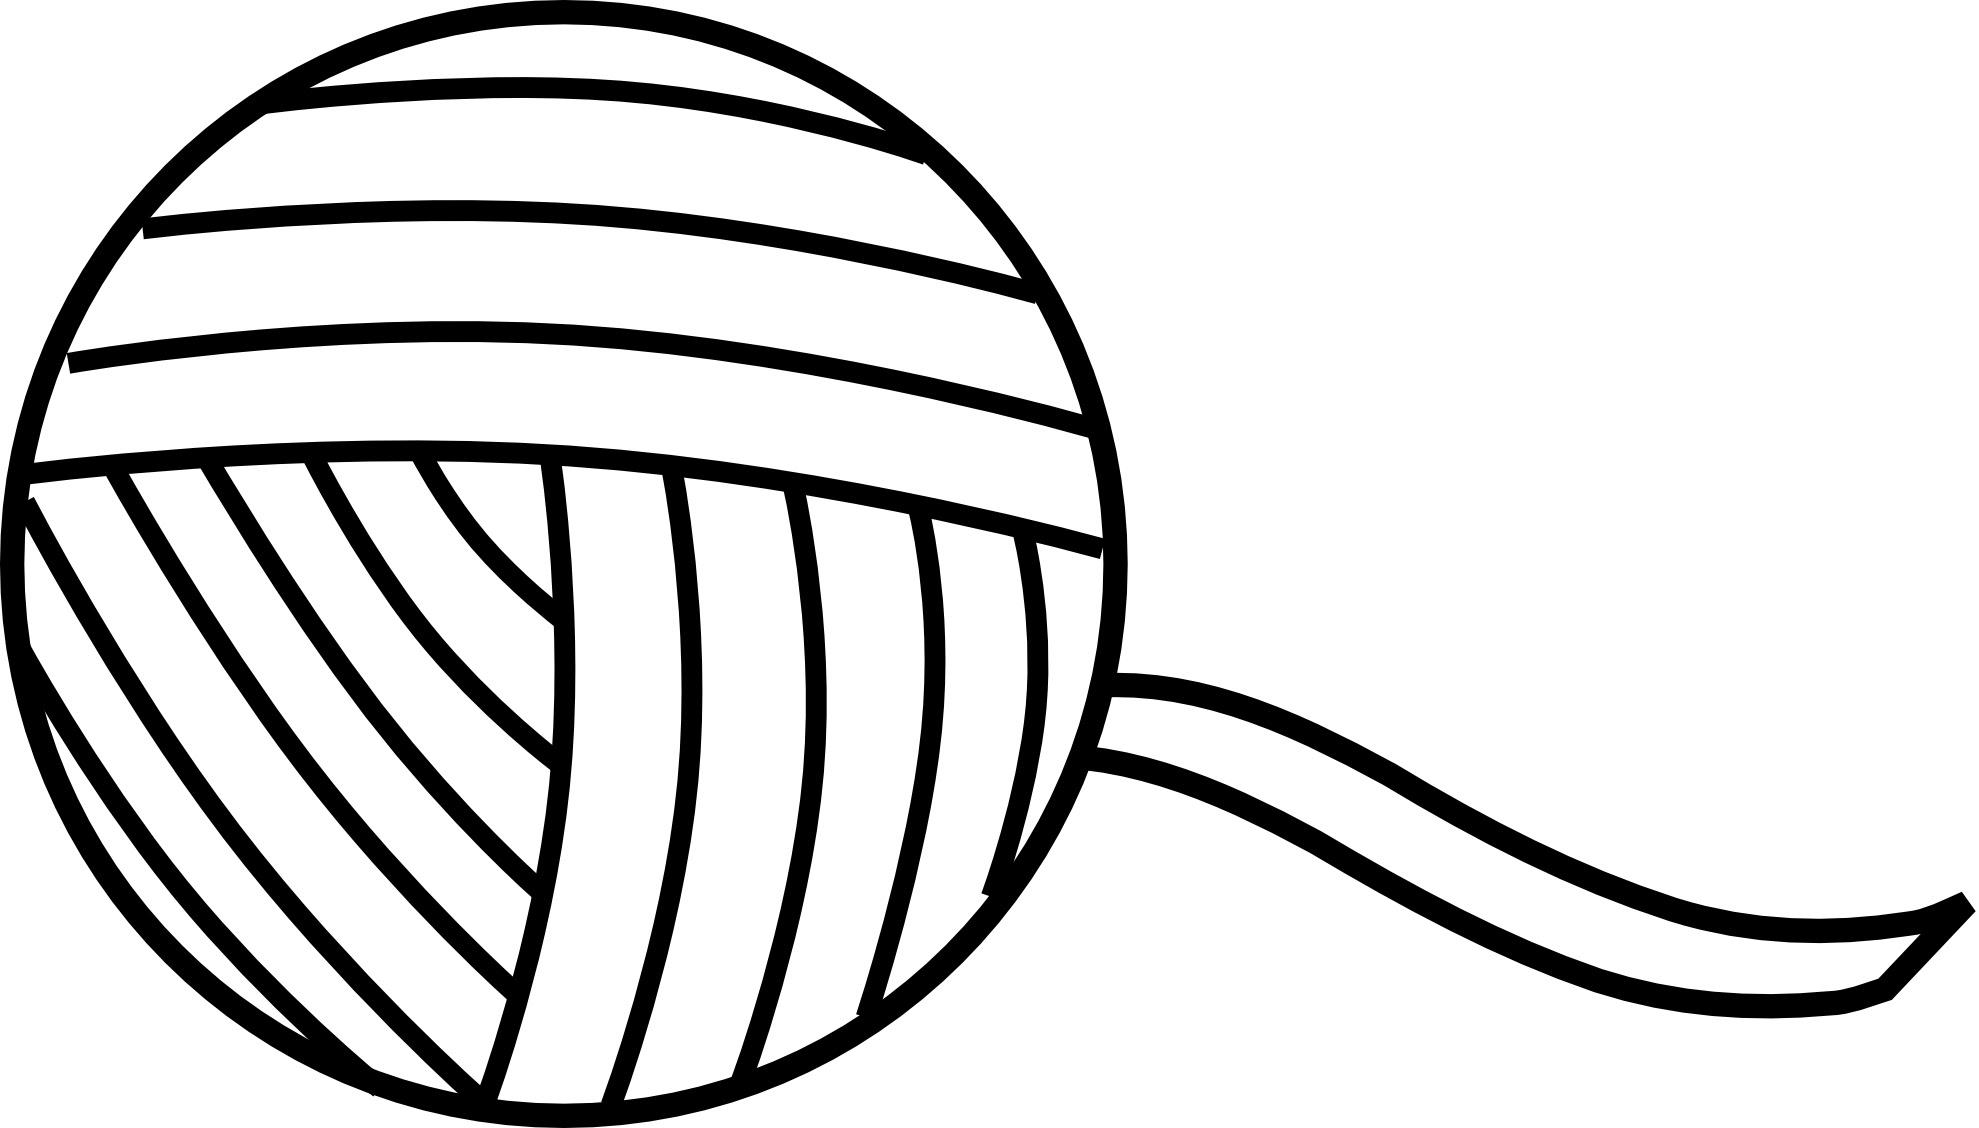 Yarn Coloring Page at GetColorings.com | Free printable ...